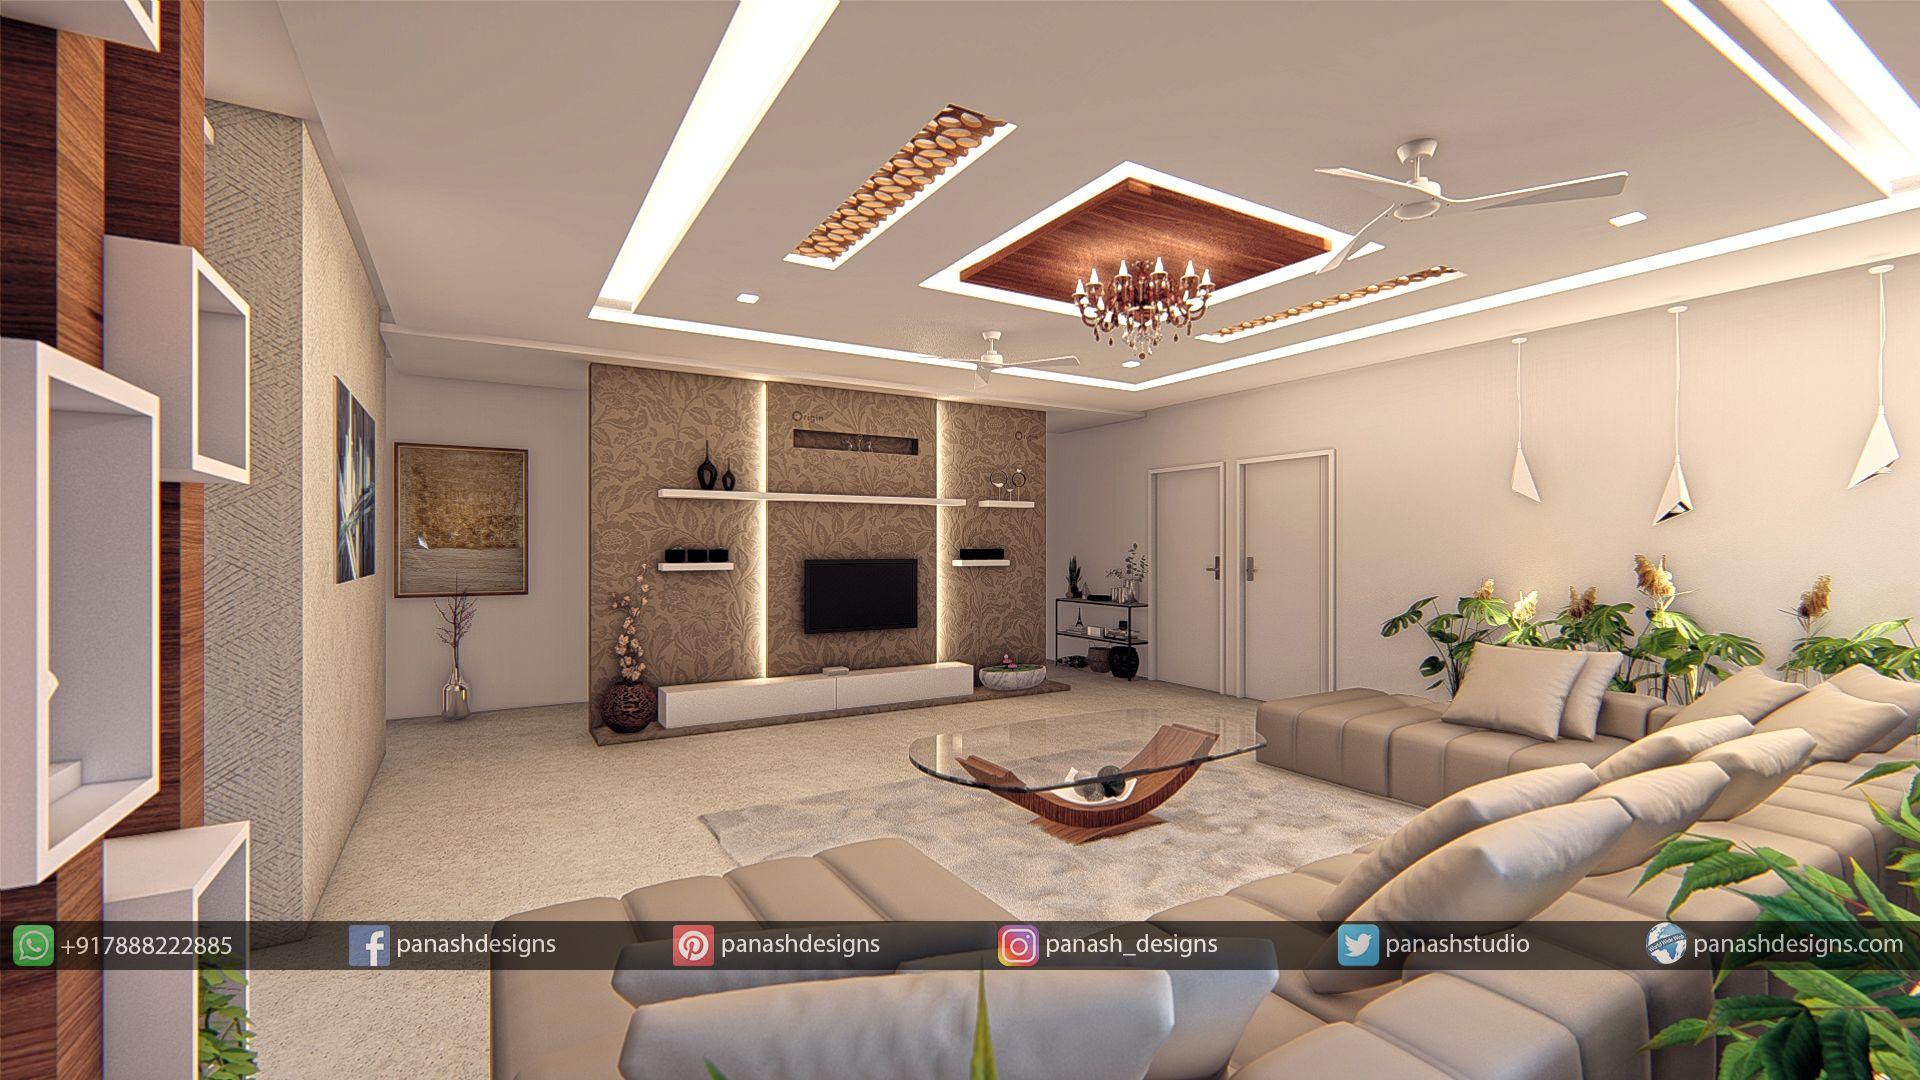 Residential Interior Designs Residential Interior Design Home